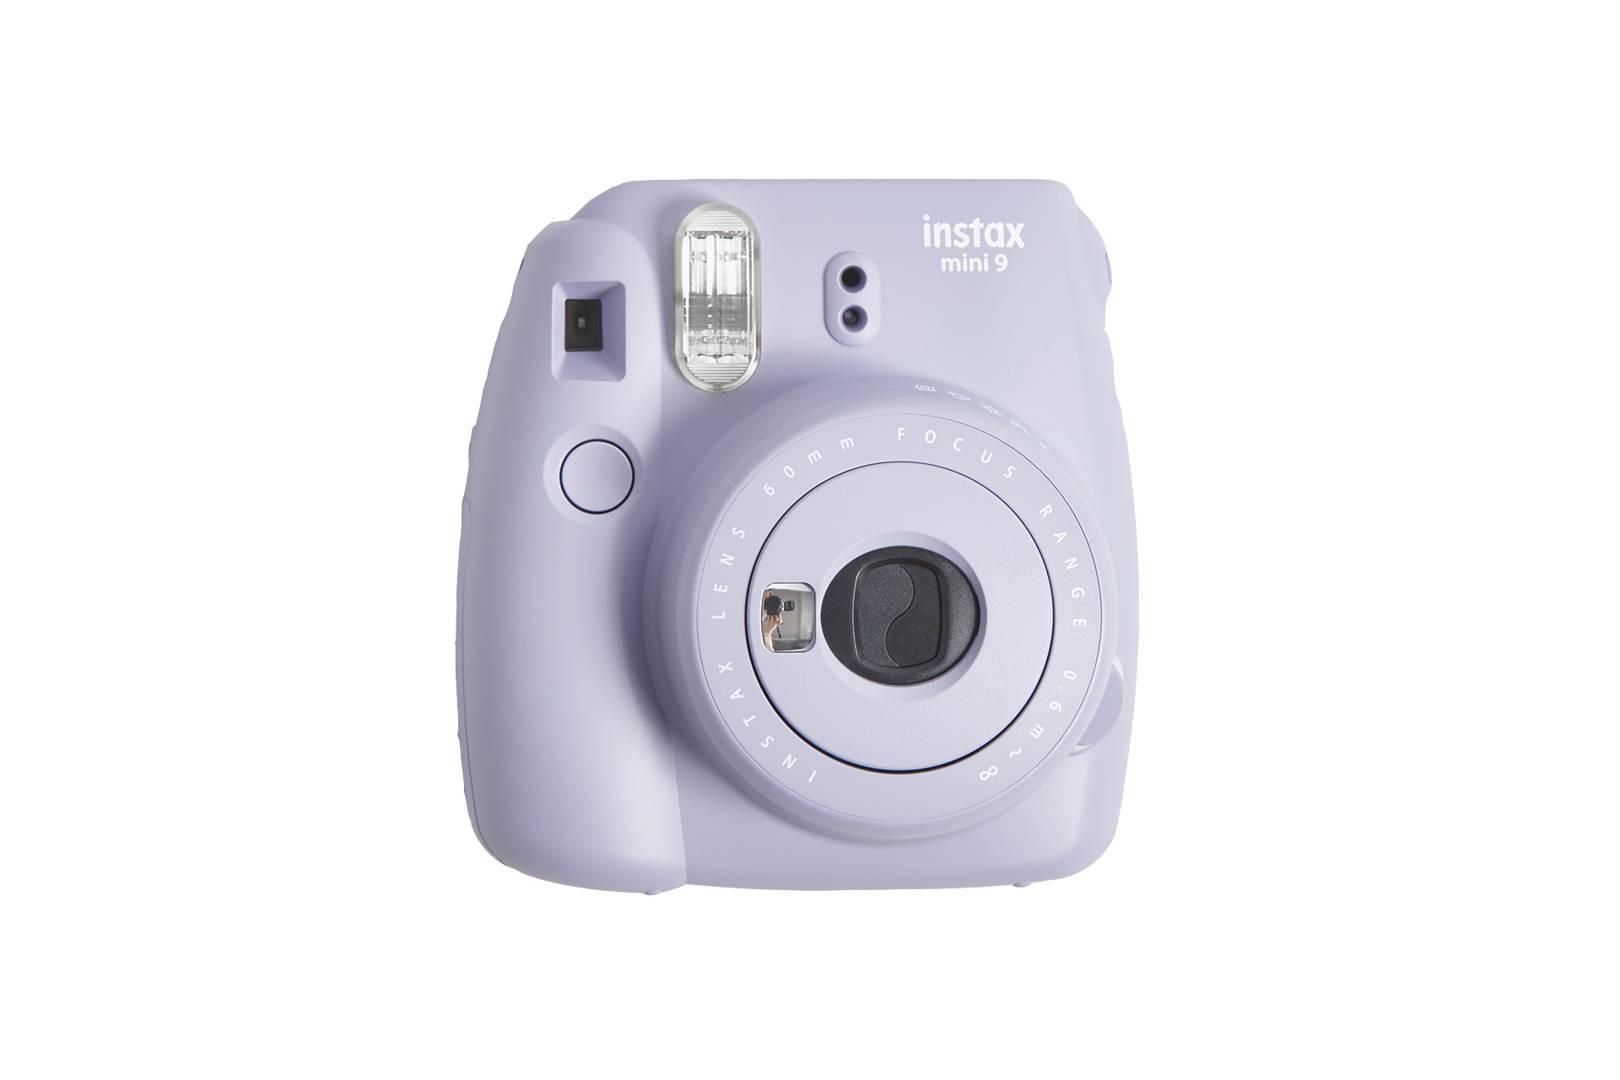 Polaroid Camera Urban Outfitters : Fuji instax camera urban outfitters instant archives page of